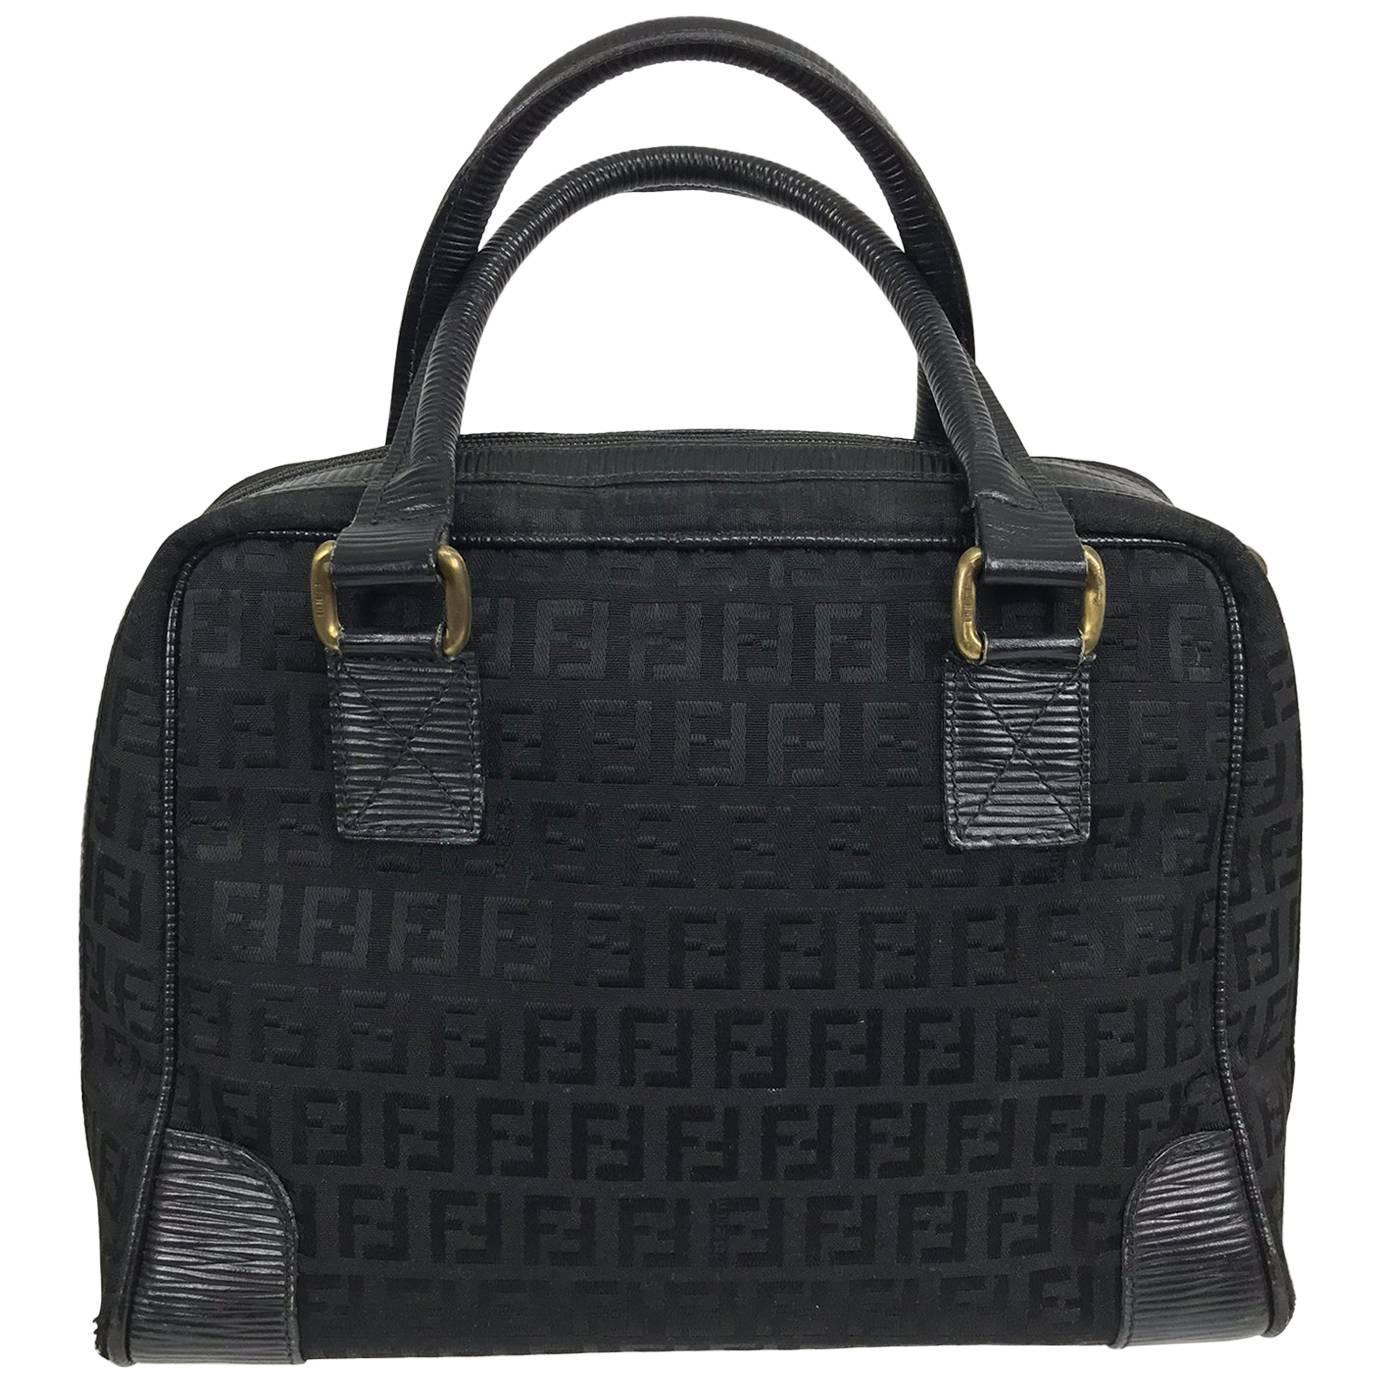 Fendi Black Logo Canvas And Leather Handbag 1970s C6moQVfG